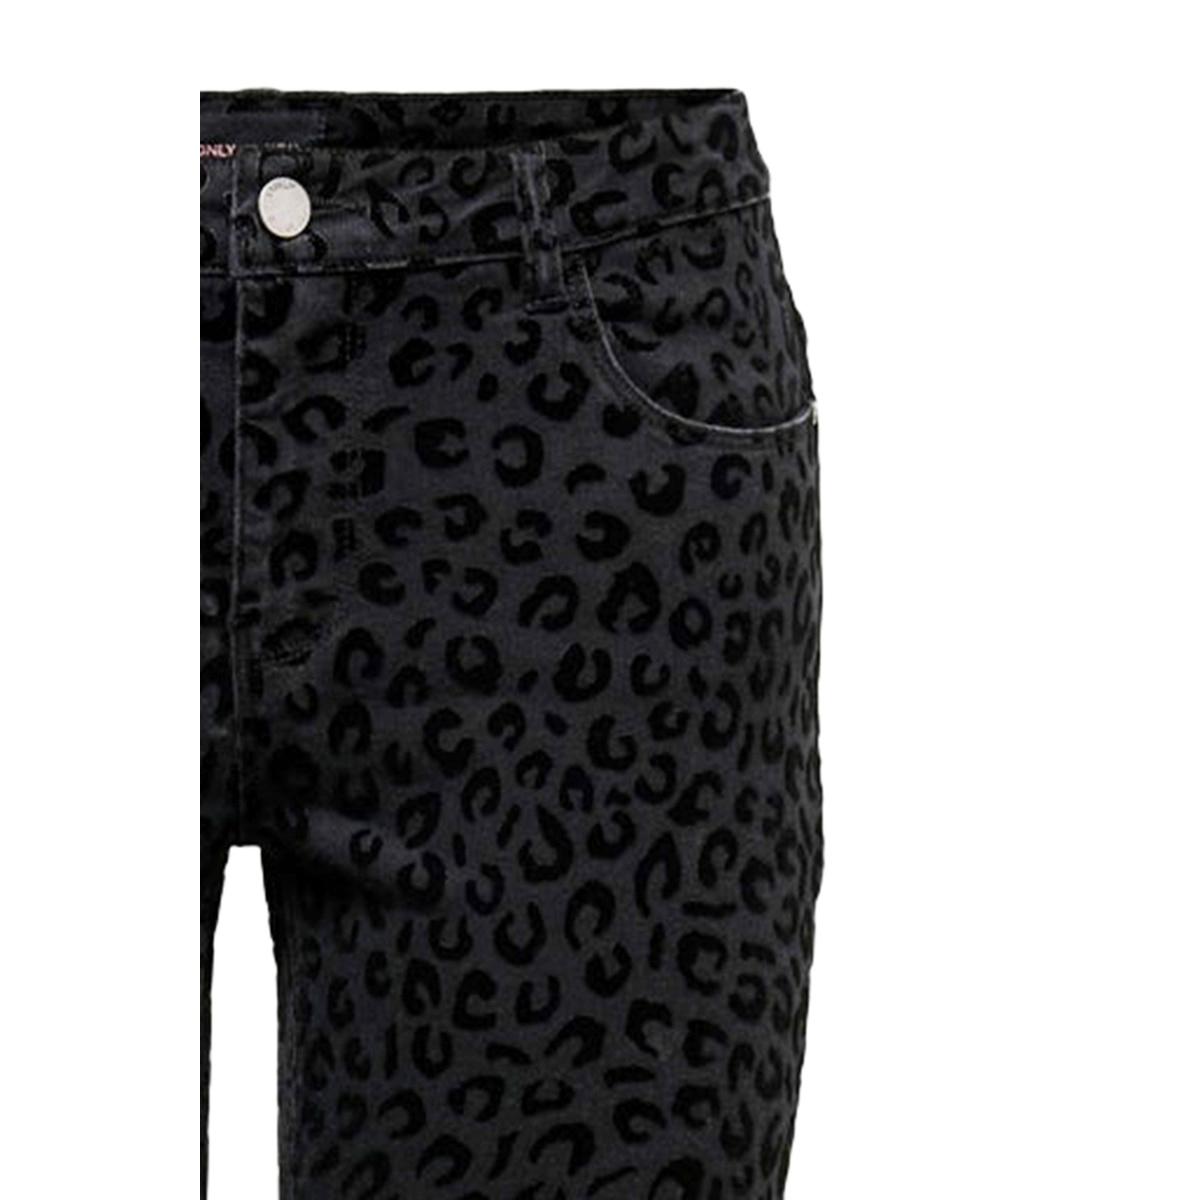 onycarmen ankle flock leo dnm jeans 15190755 only jeans black